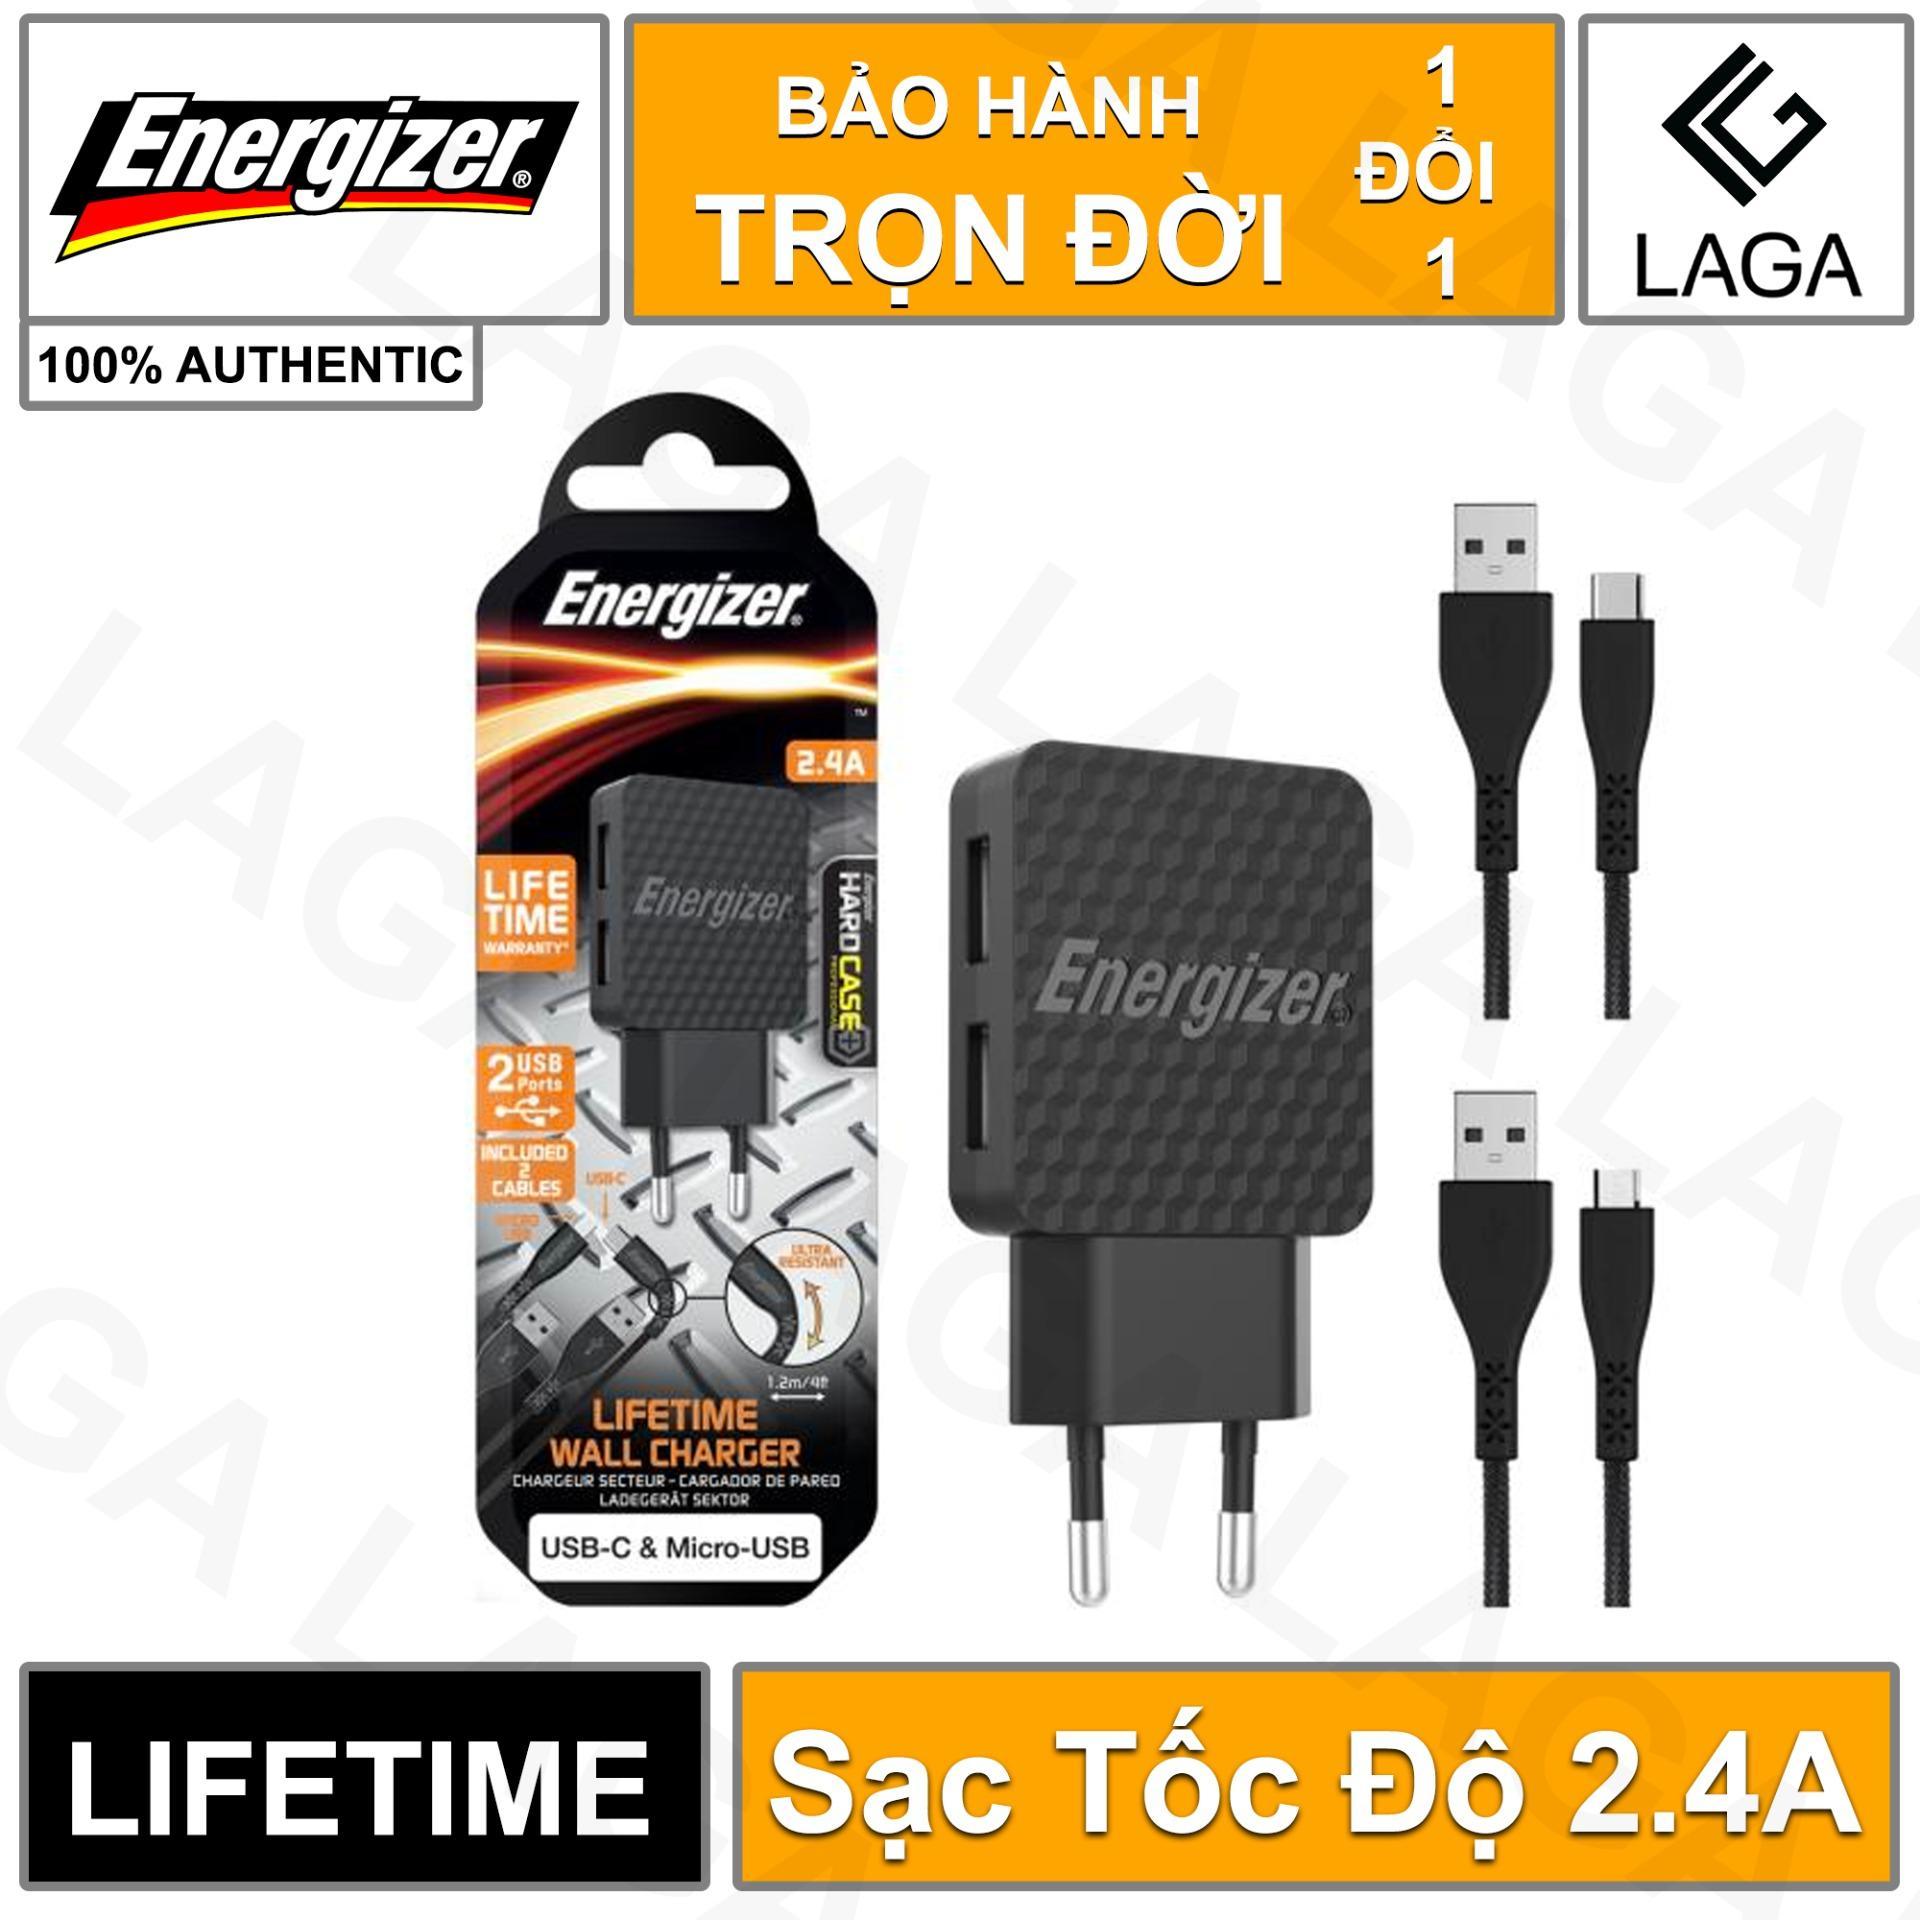 Sạc Energizer Lifetime Warranty 2.4A 2 USB kèm cáp USB Type C 2.0 & Micro USB - AC2BEULCMM